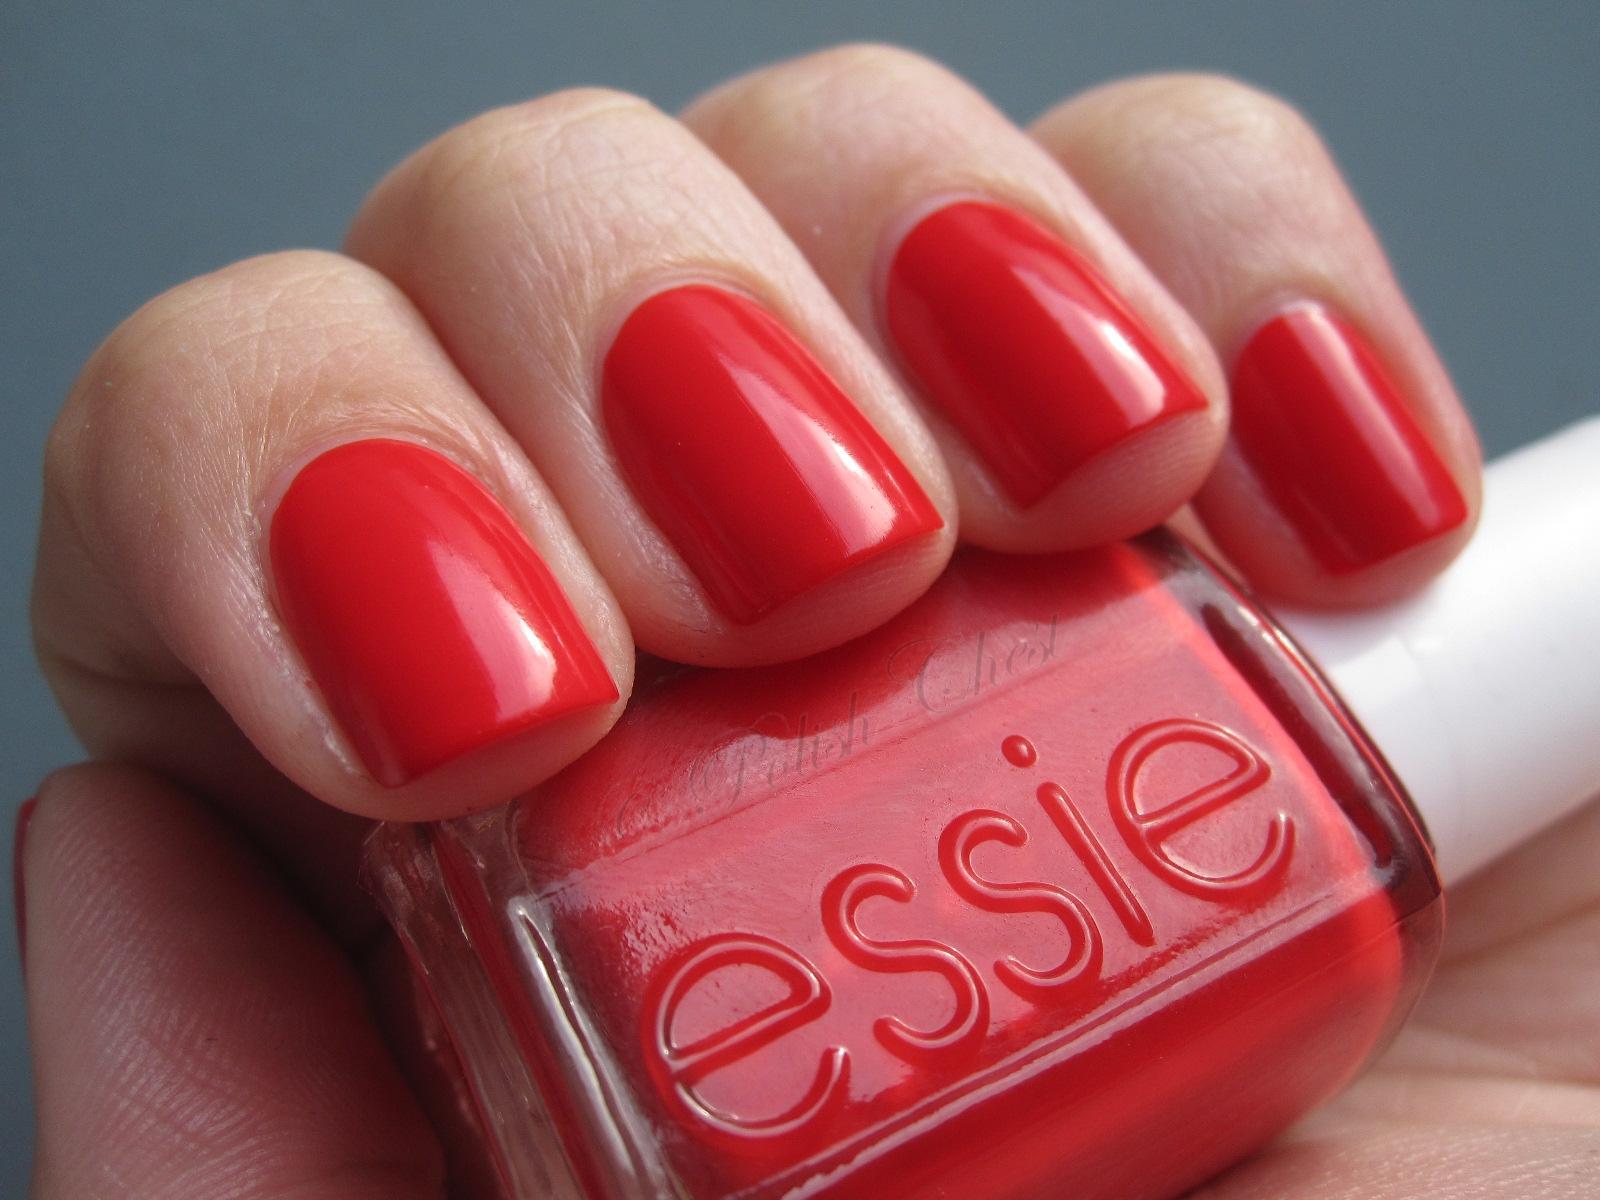 Polish chest essie fifth avenue for 5th ave nail salon